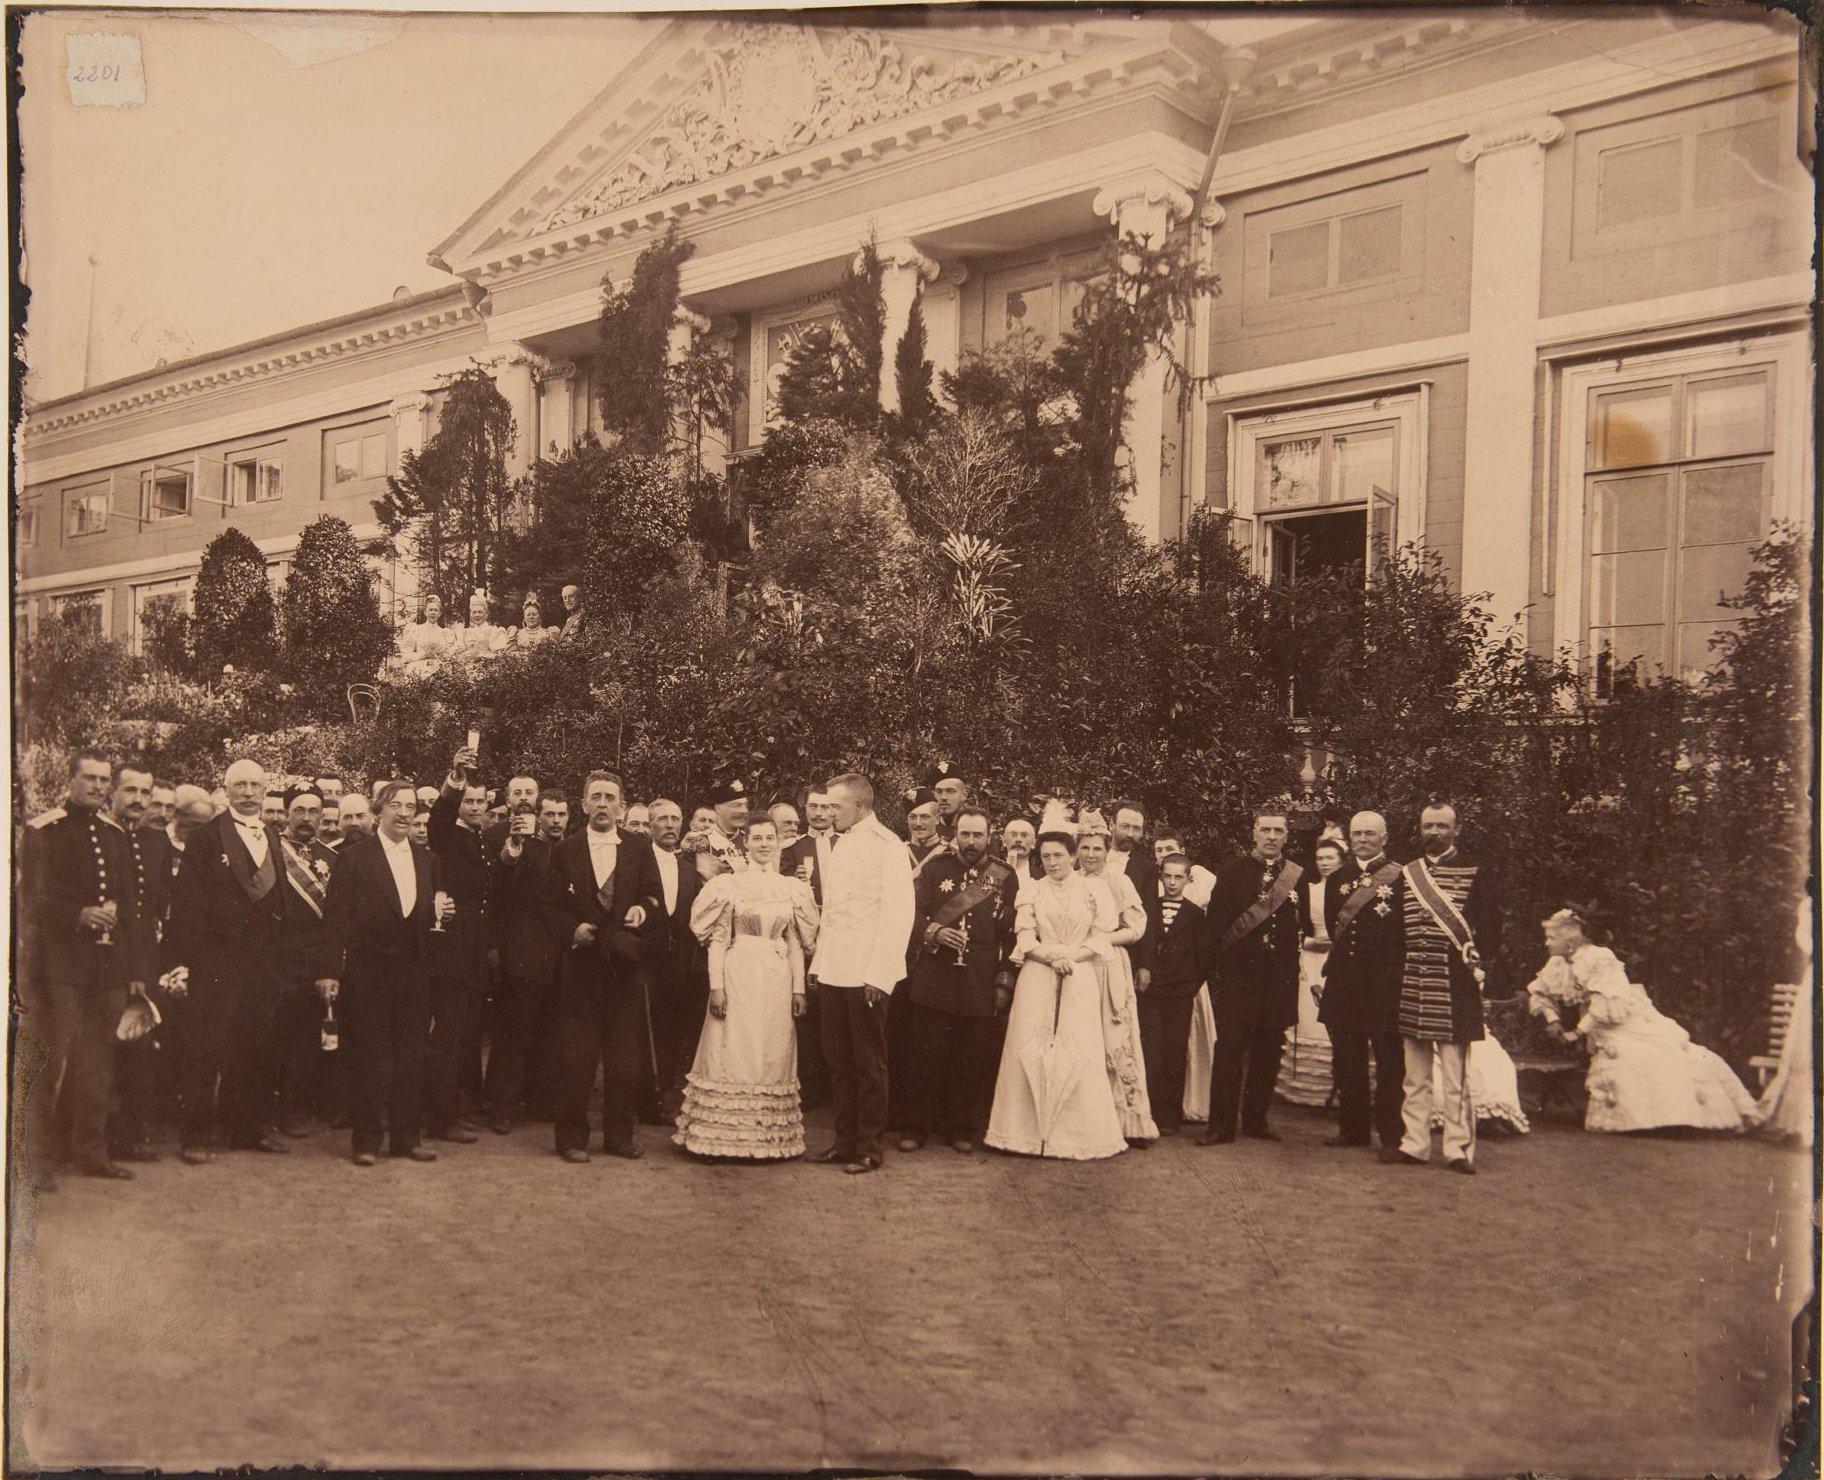 1894. Свадьба графини А.С. Шереметевой с А.П. Сабуровым в Кускове